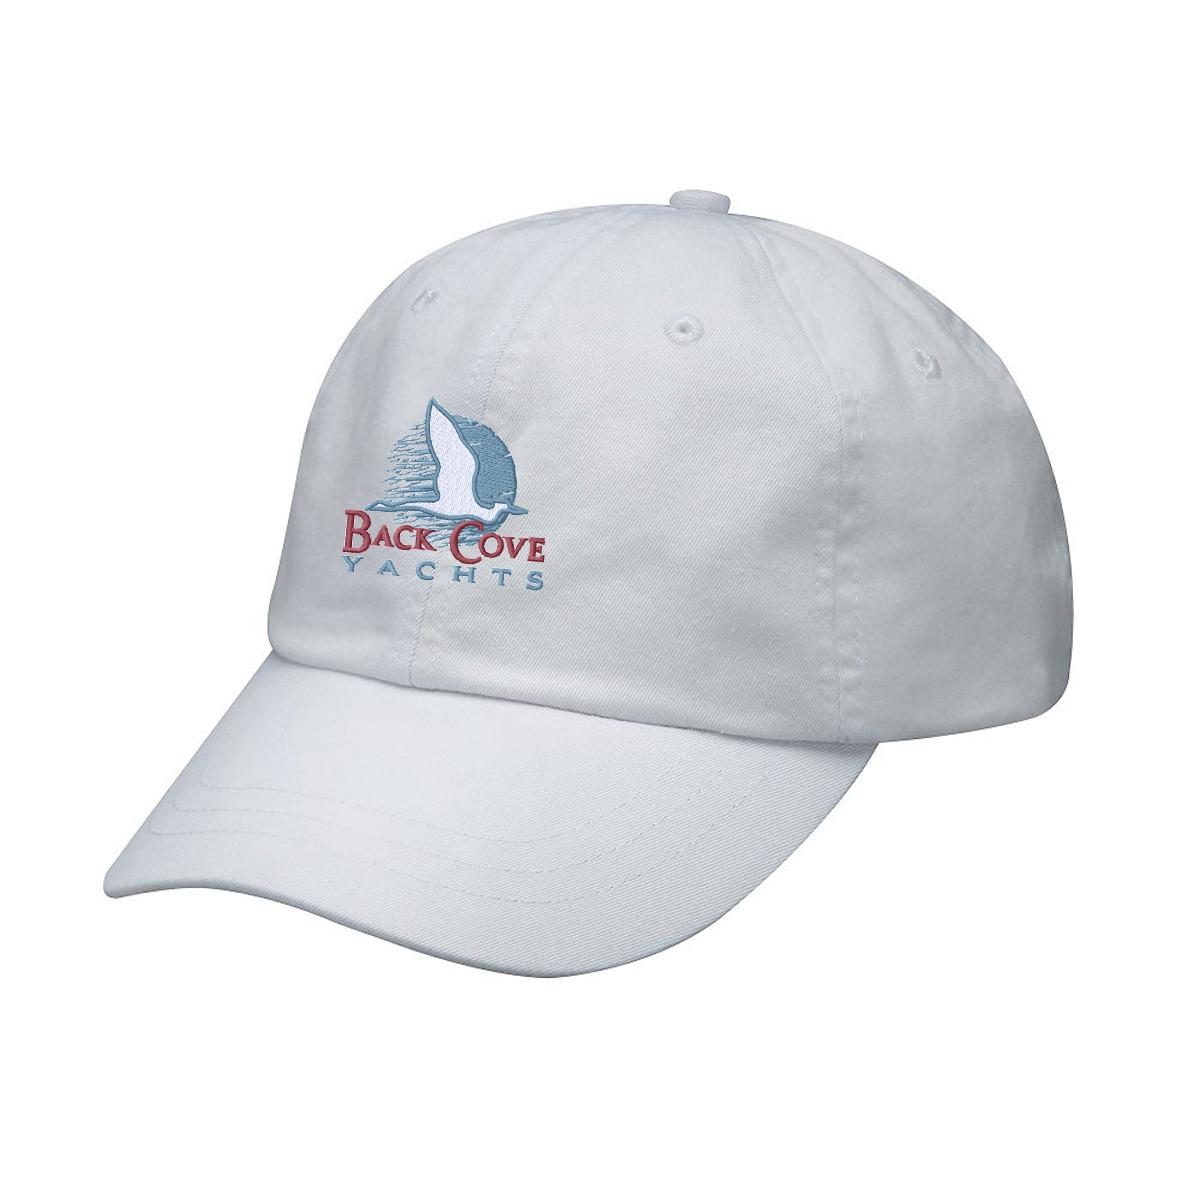 Back Cove Yachts - Adams Hat